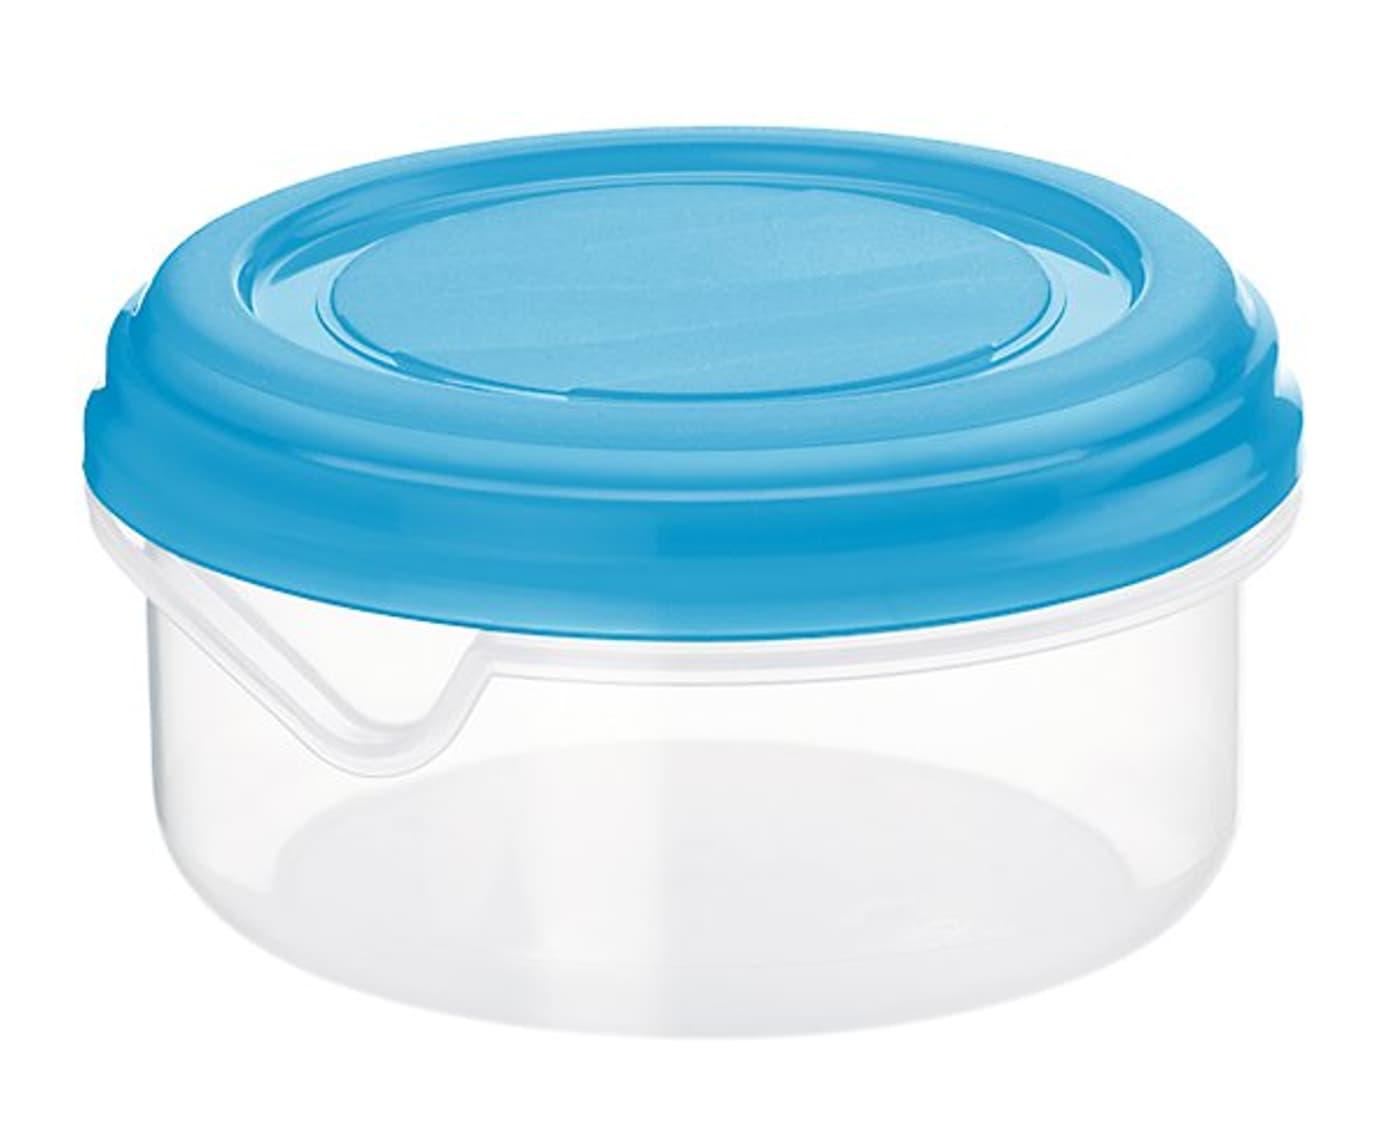 Mini Kühlschrank Migros : M topline cool kühlschrankdose l migros